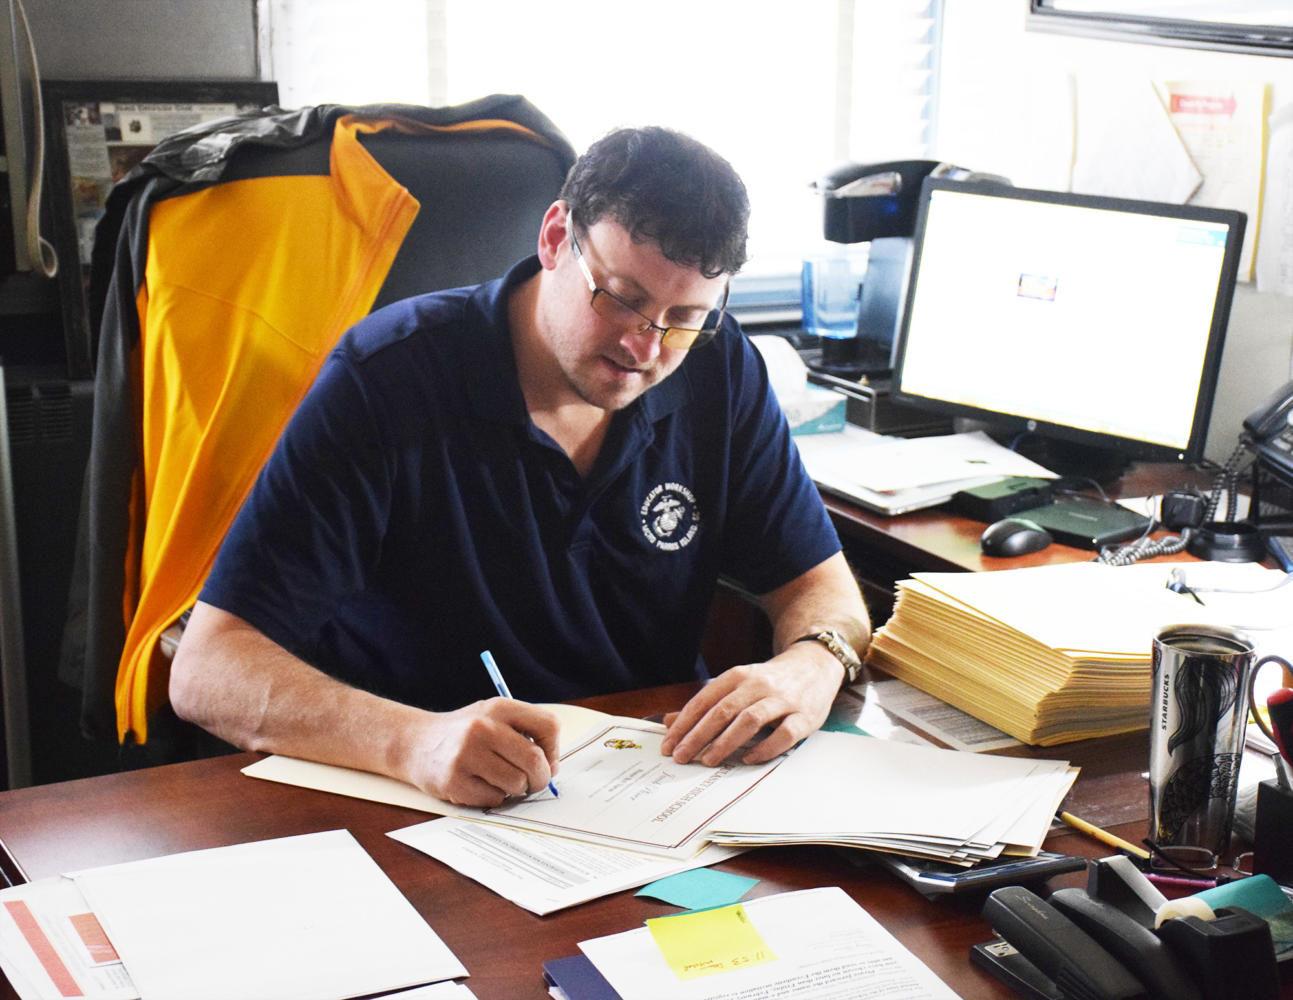 Principal+Sam+Wynkoop+signs+Honor+Roll+certificates+in+his+office+Feb.+9.